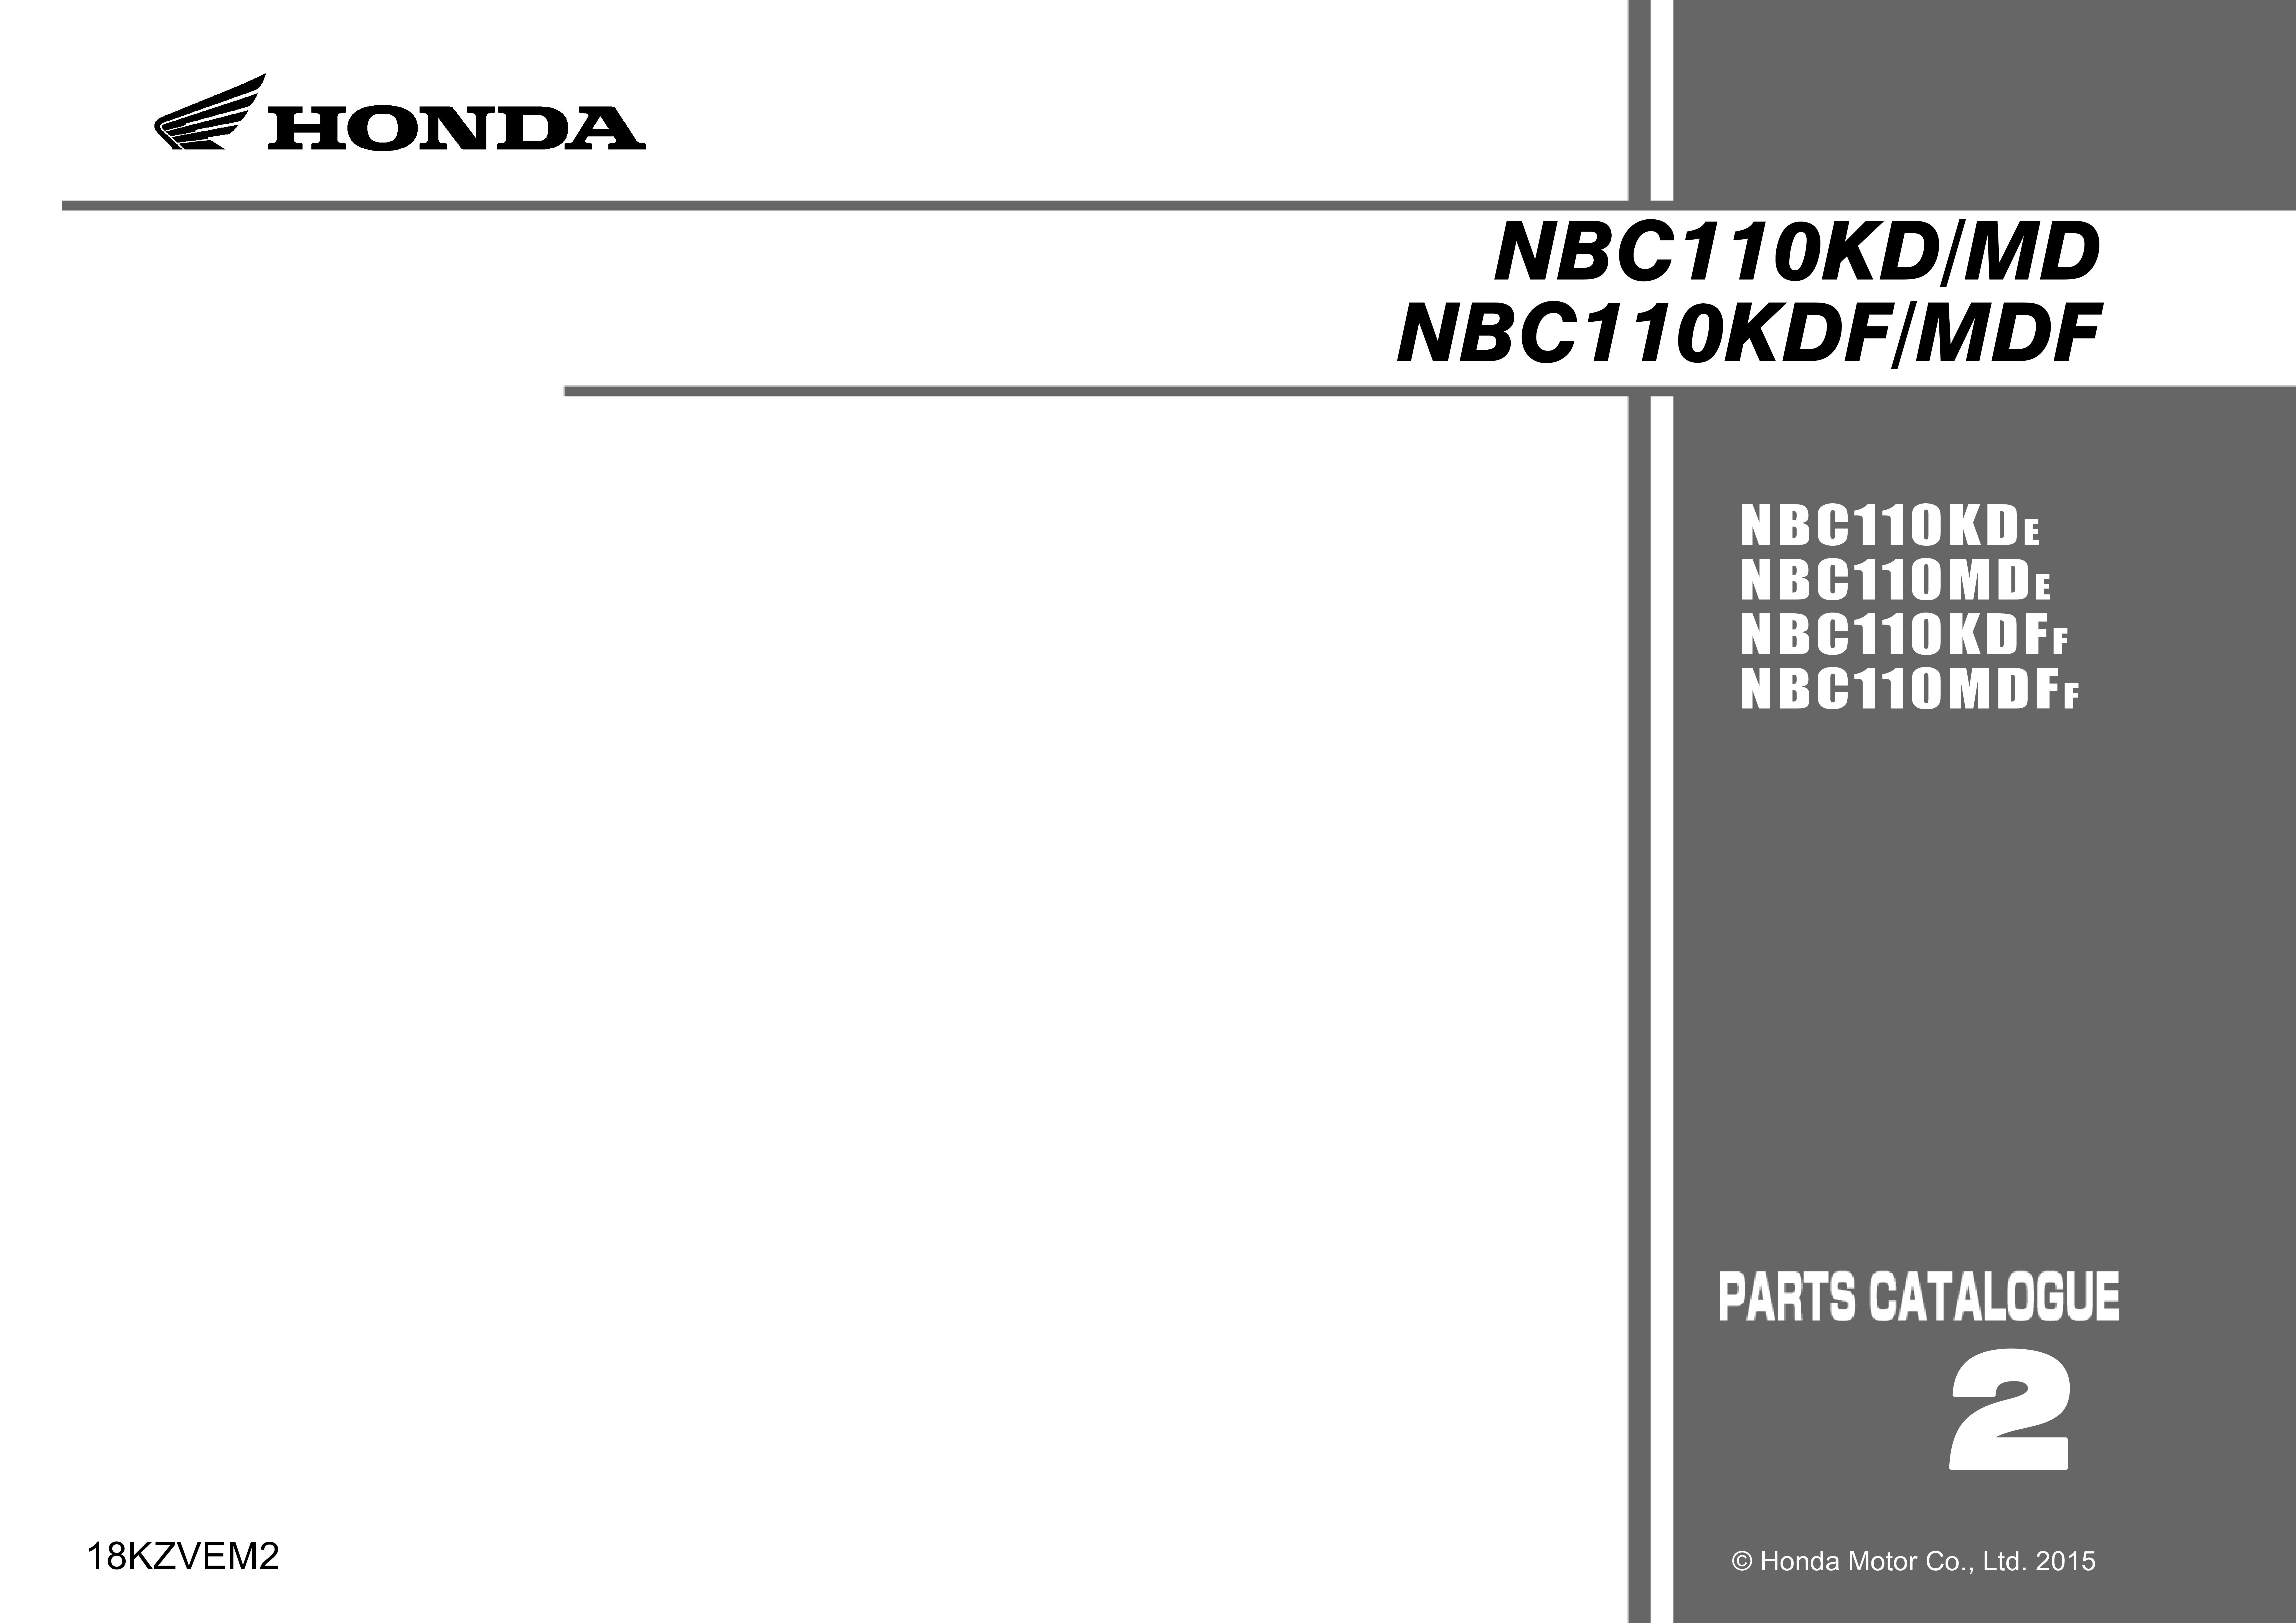 Parts List for Honda NBC110MD Dream 110 (2015)